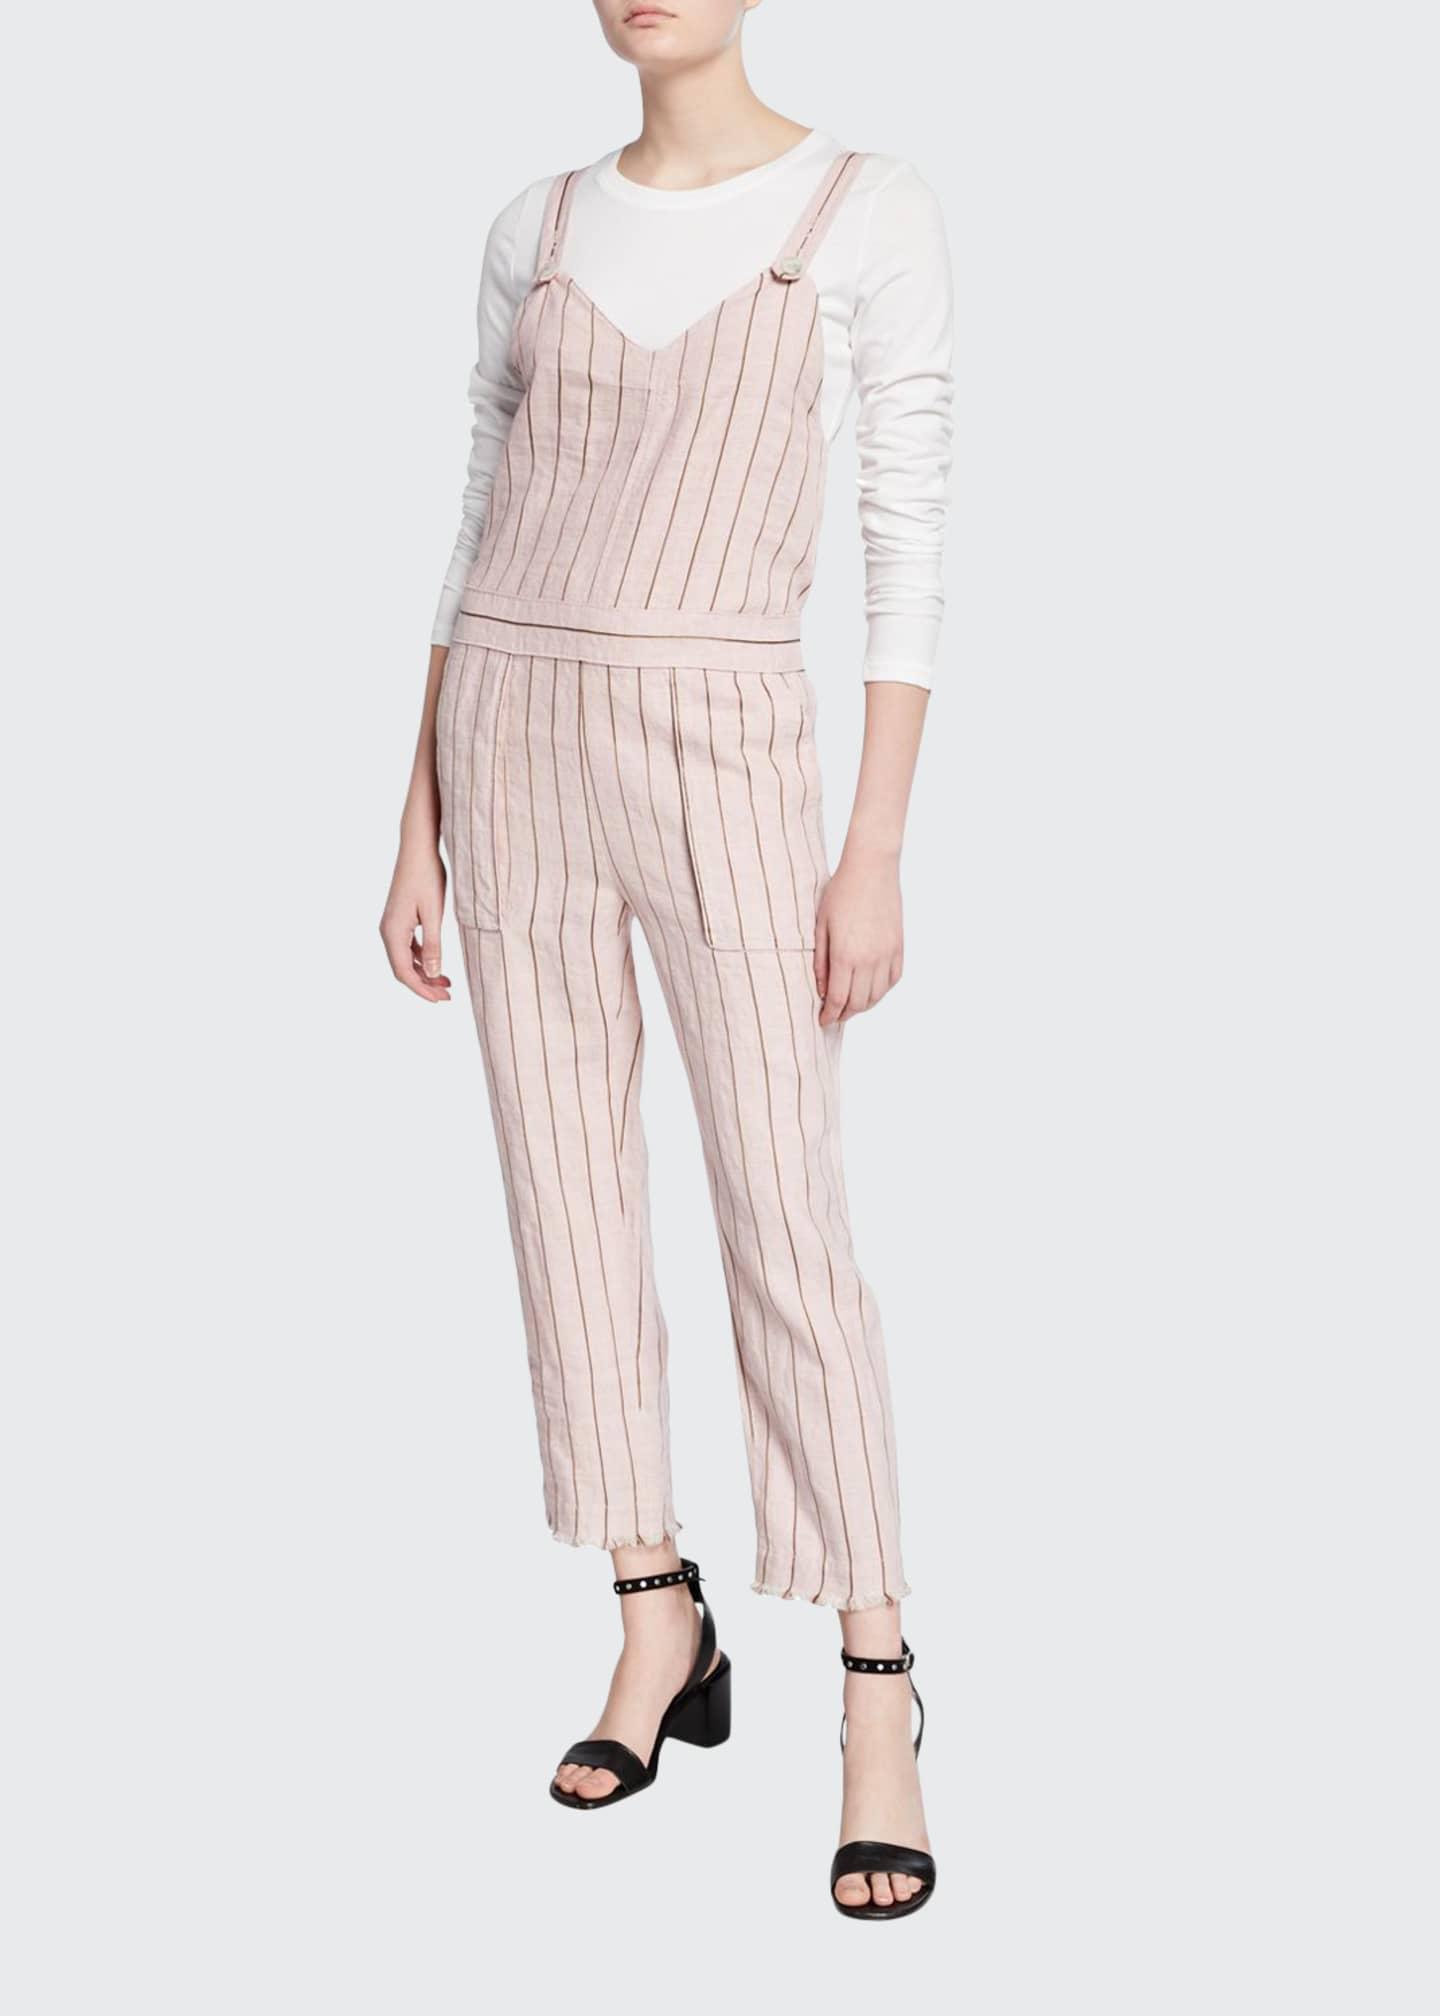 Rag & Bone Nina Striped Linen Jumpsuit